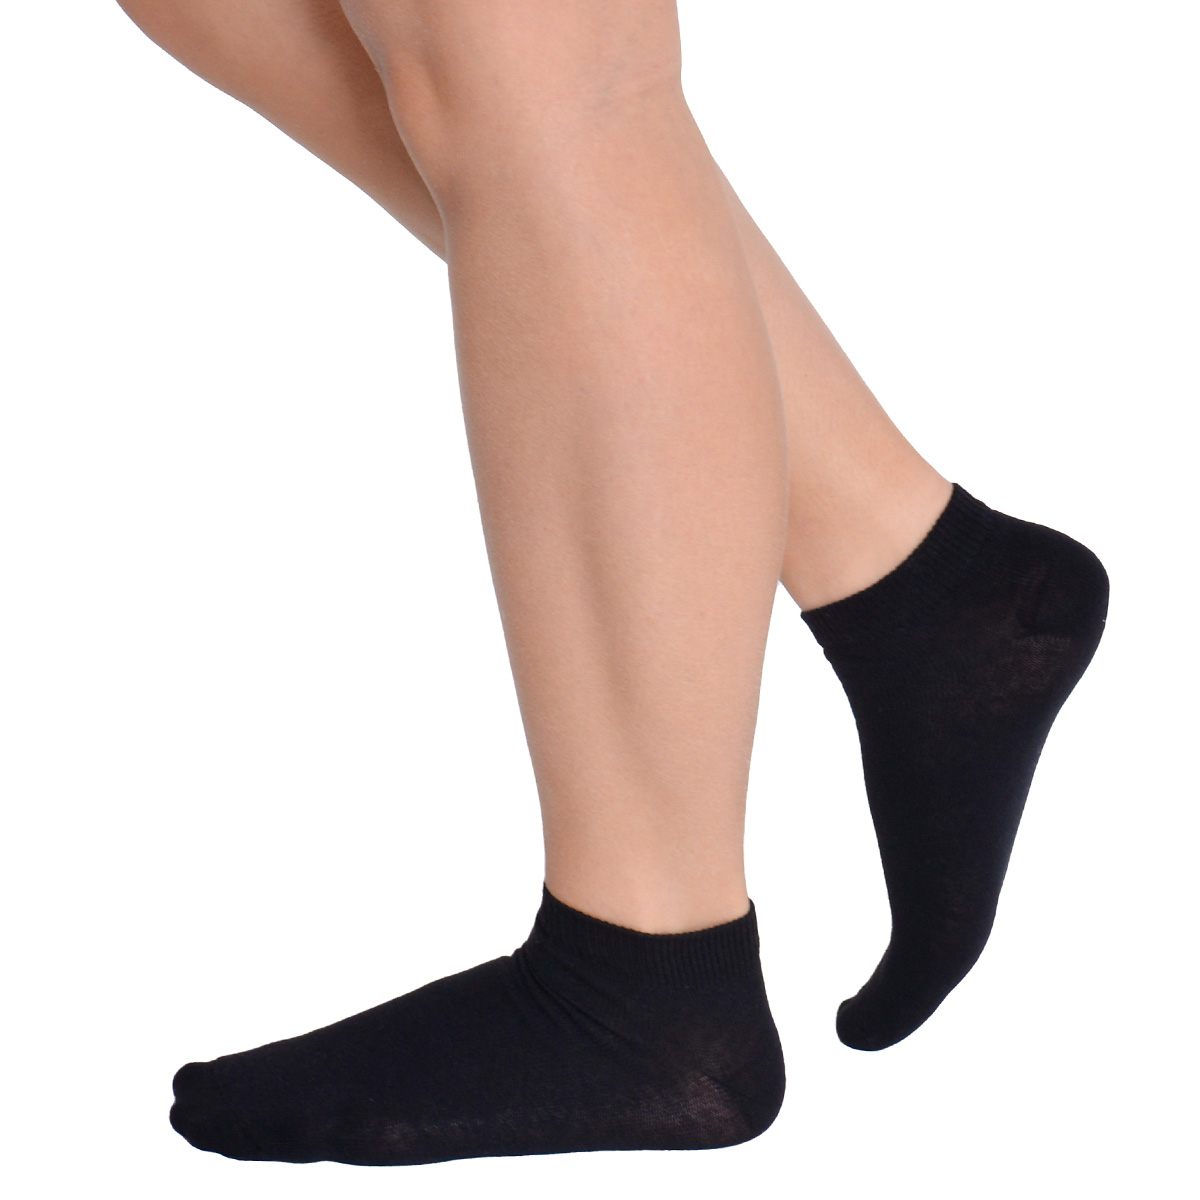 KIT com 3 meias feminina cano curto Trifil